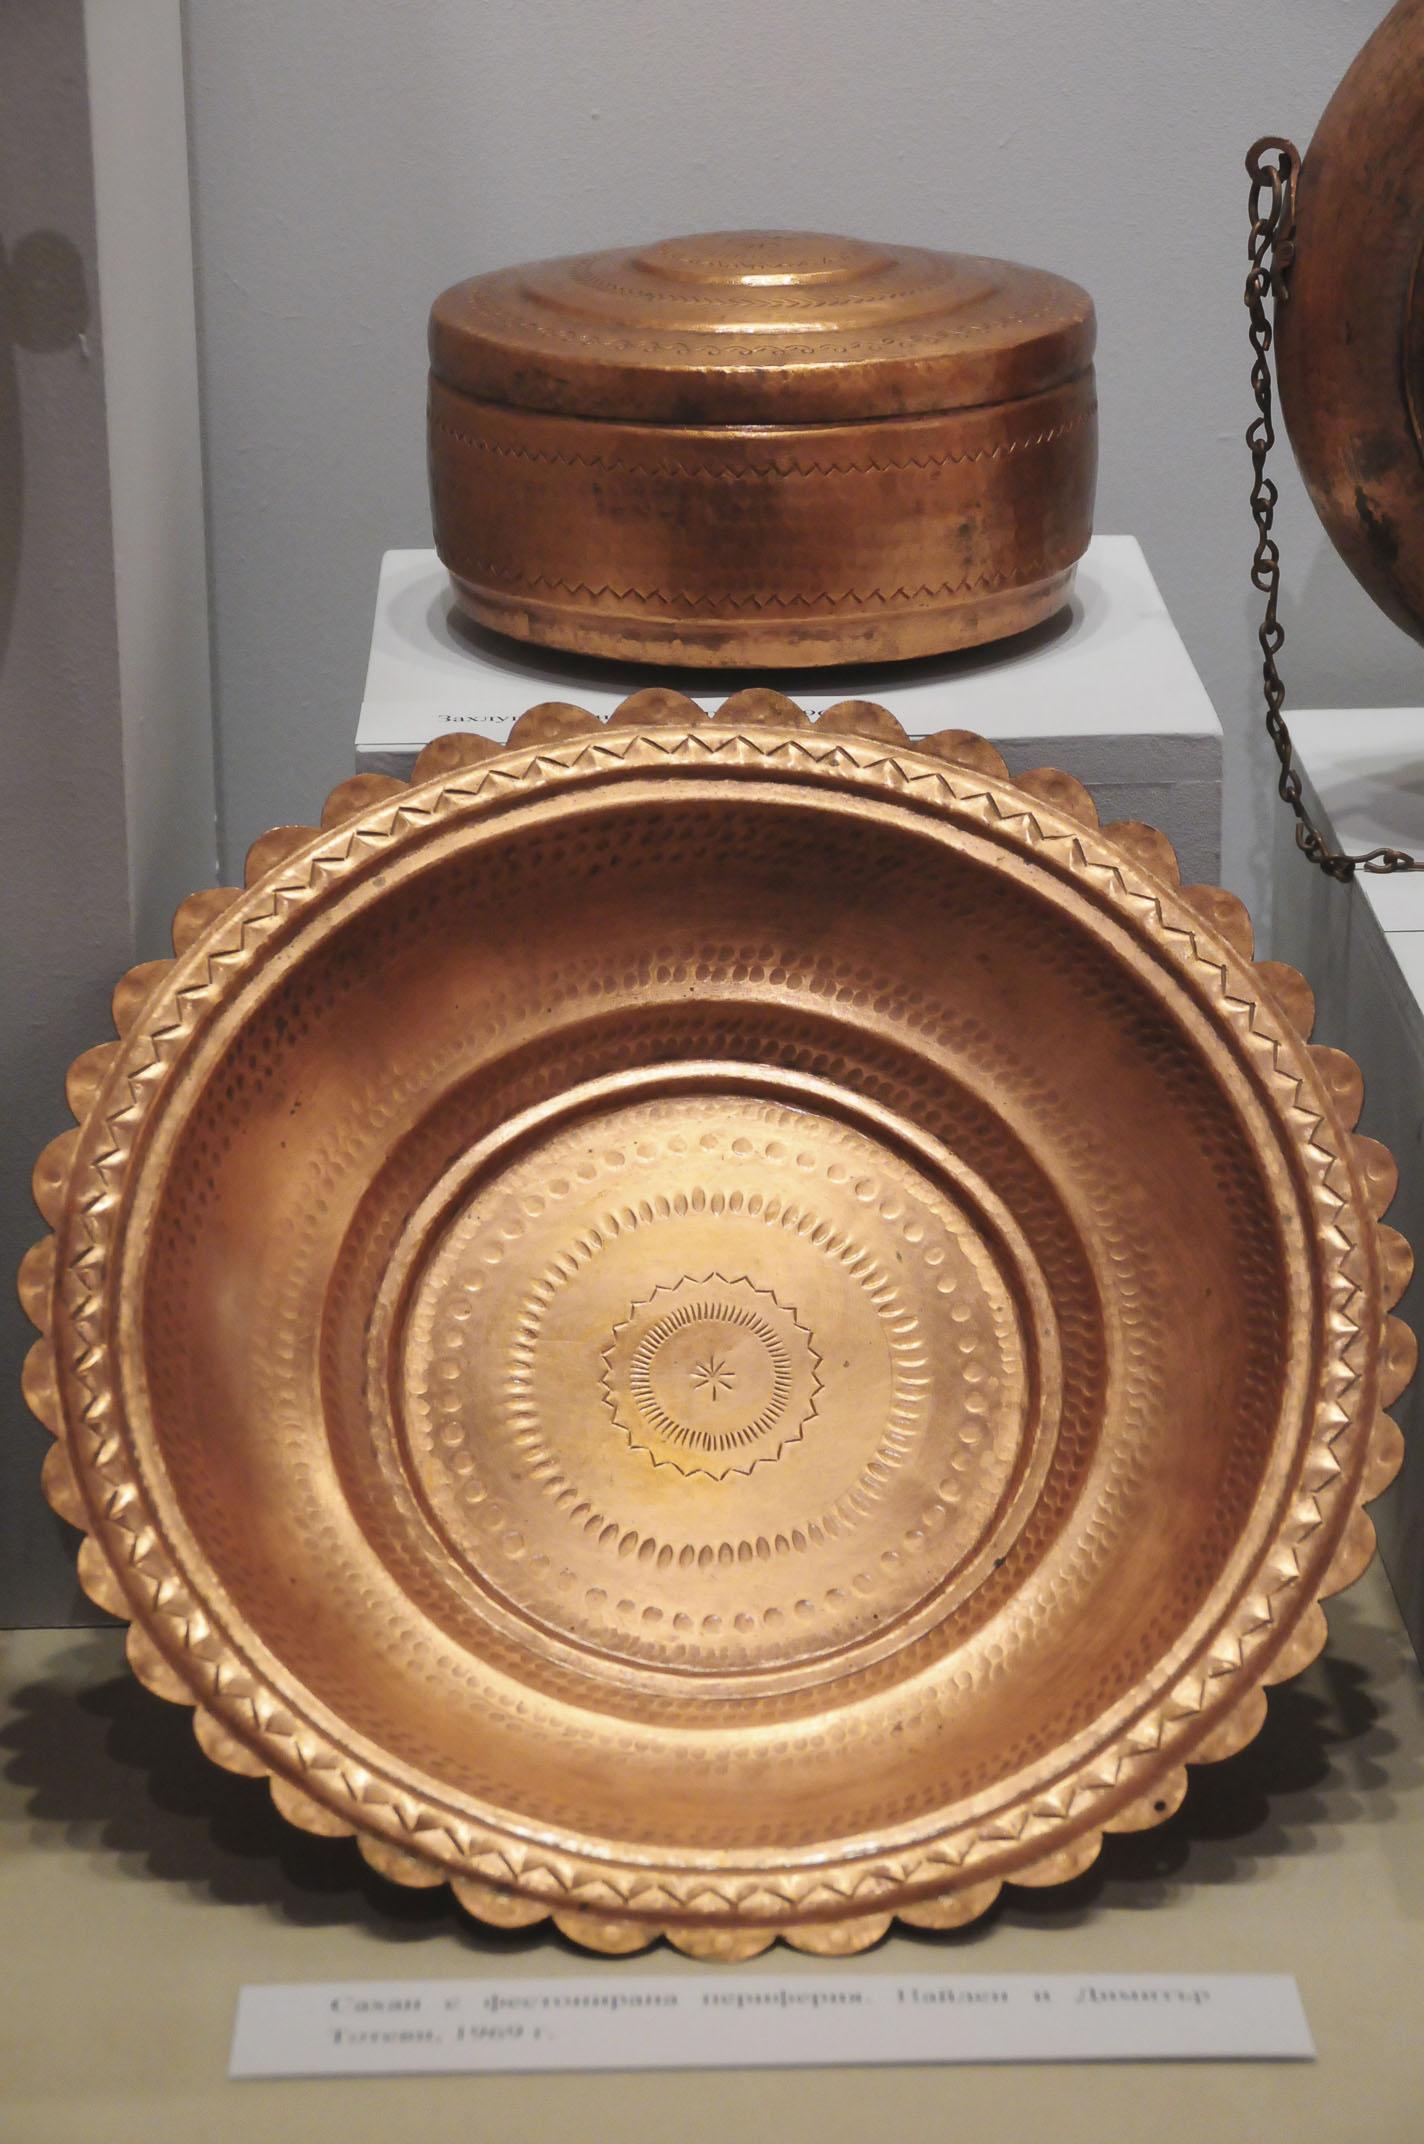 troyan-museum-mednikarstvo-ot-troyanskiq-krai-7